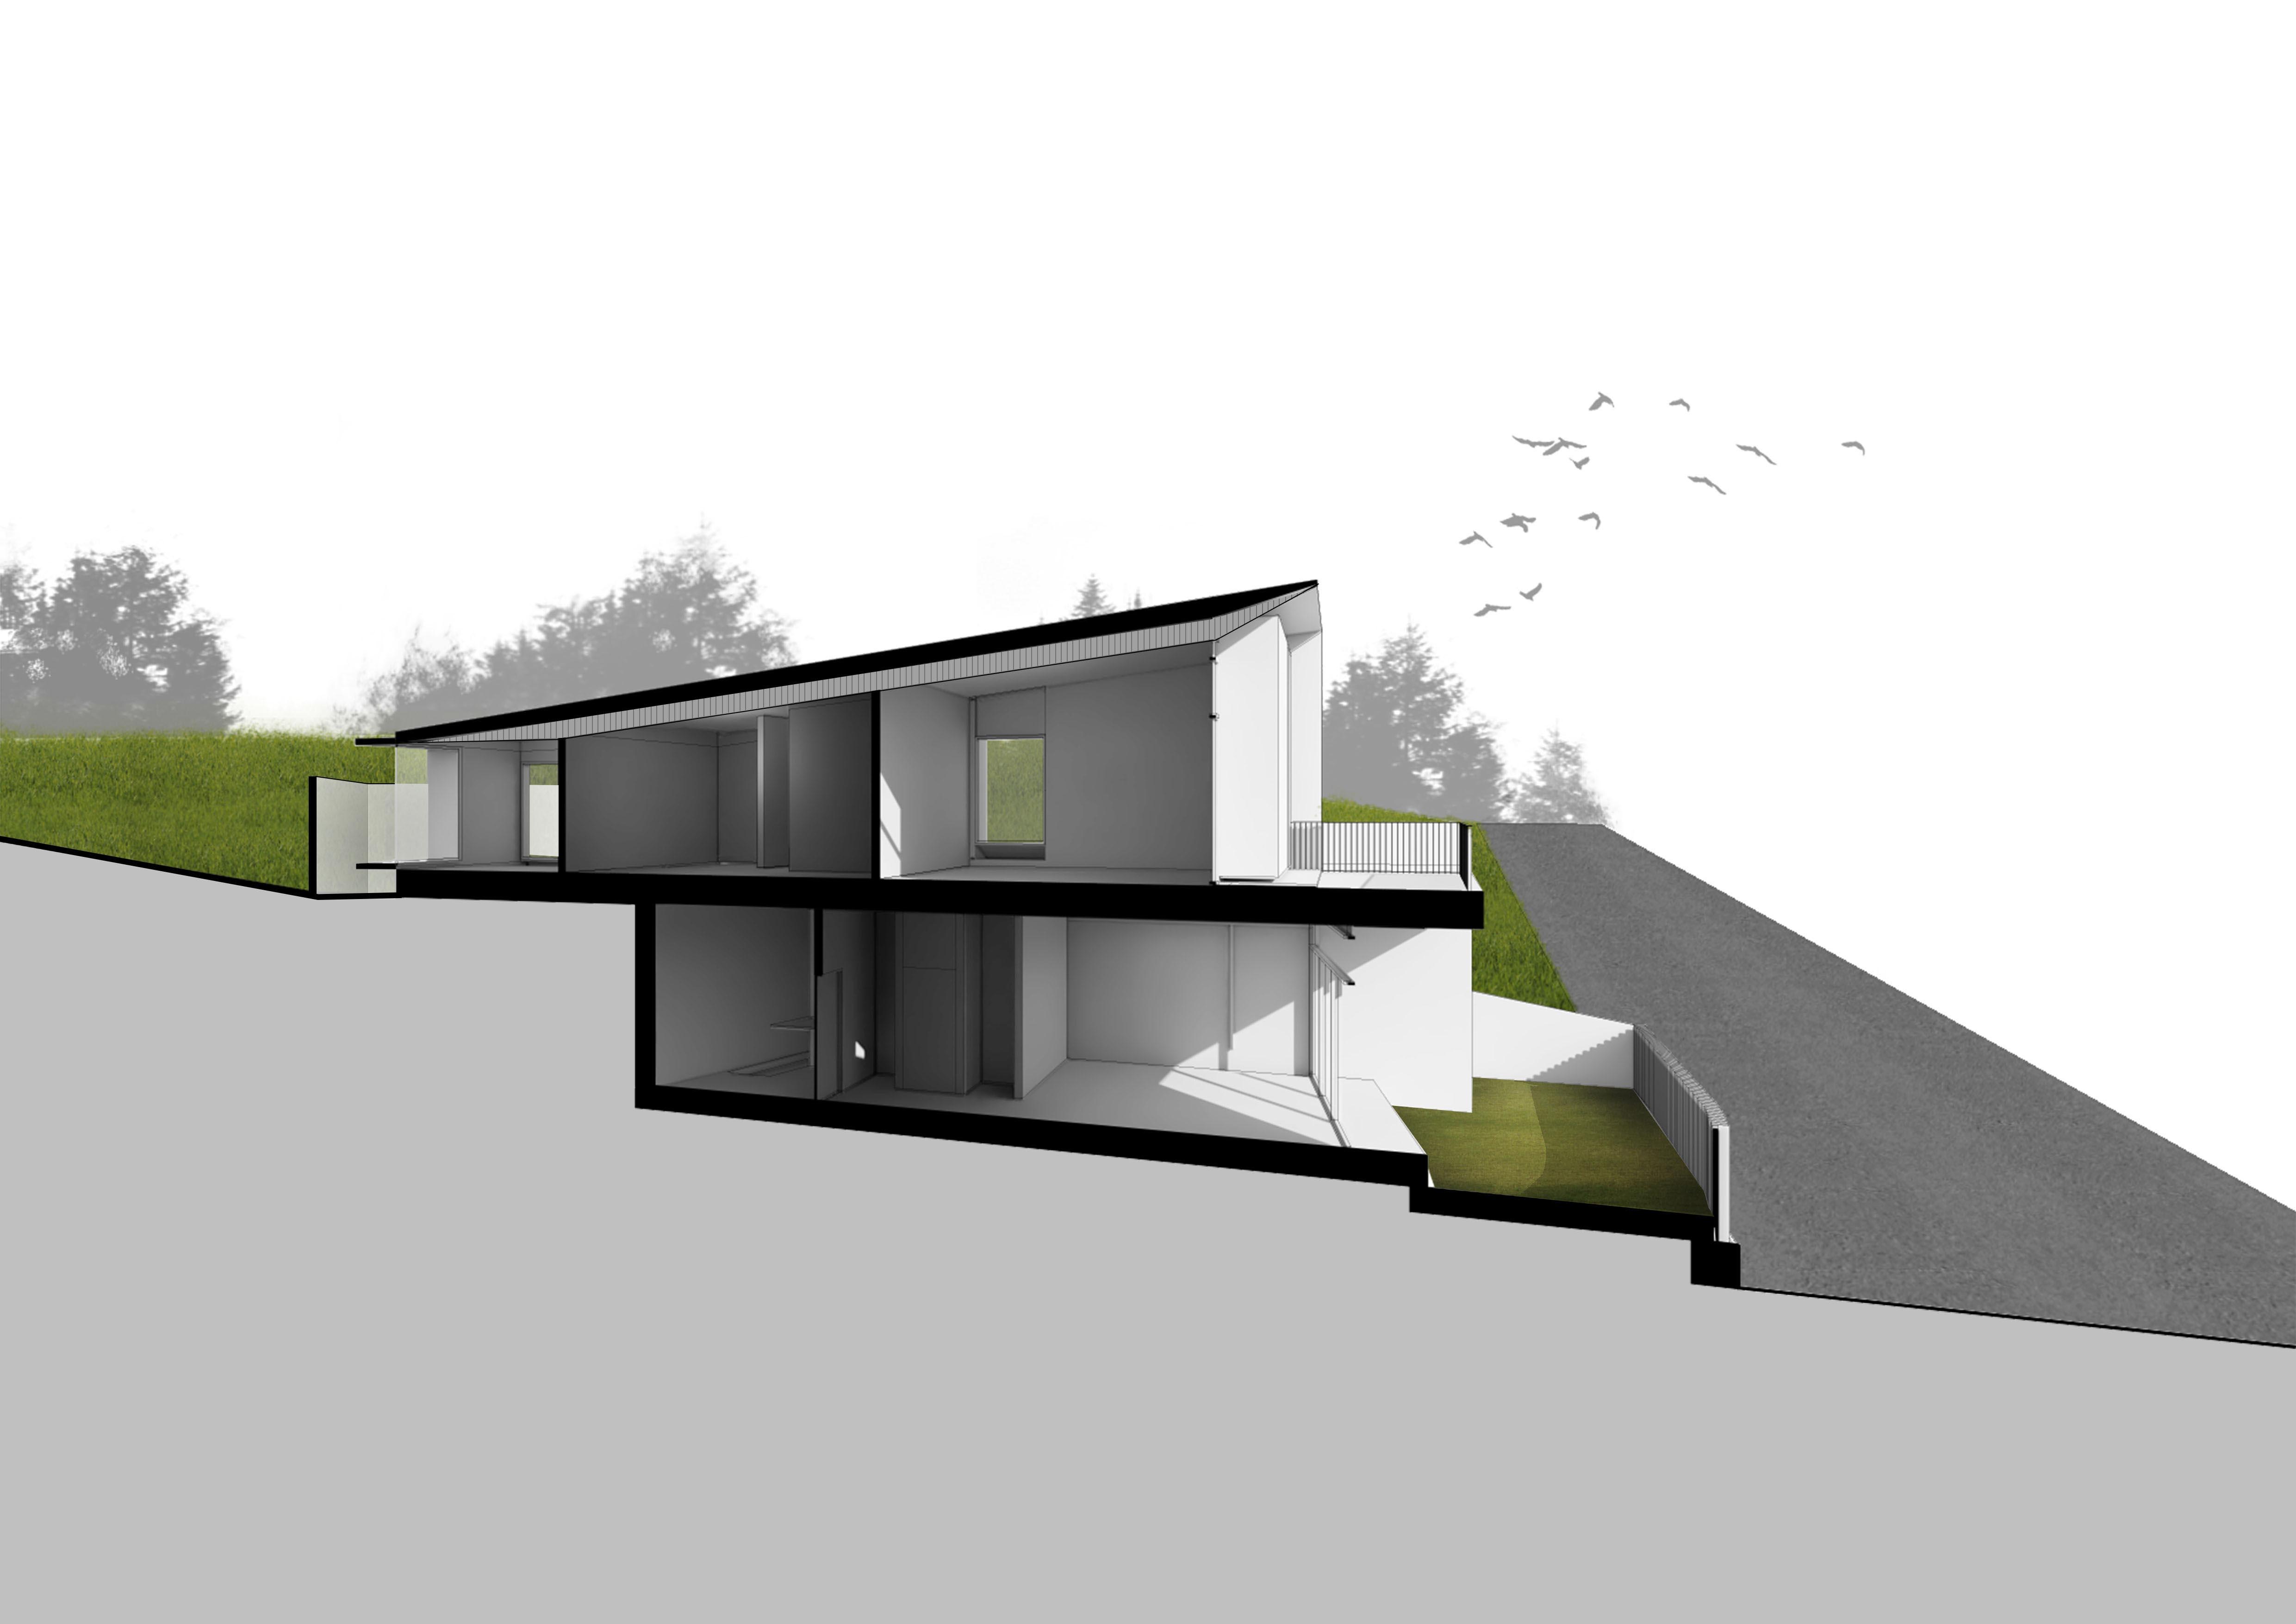 Sectional perspective C-C Zubu Design Associates